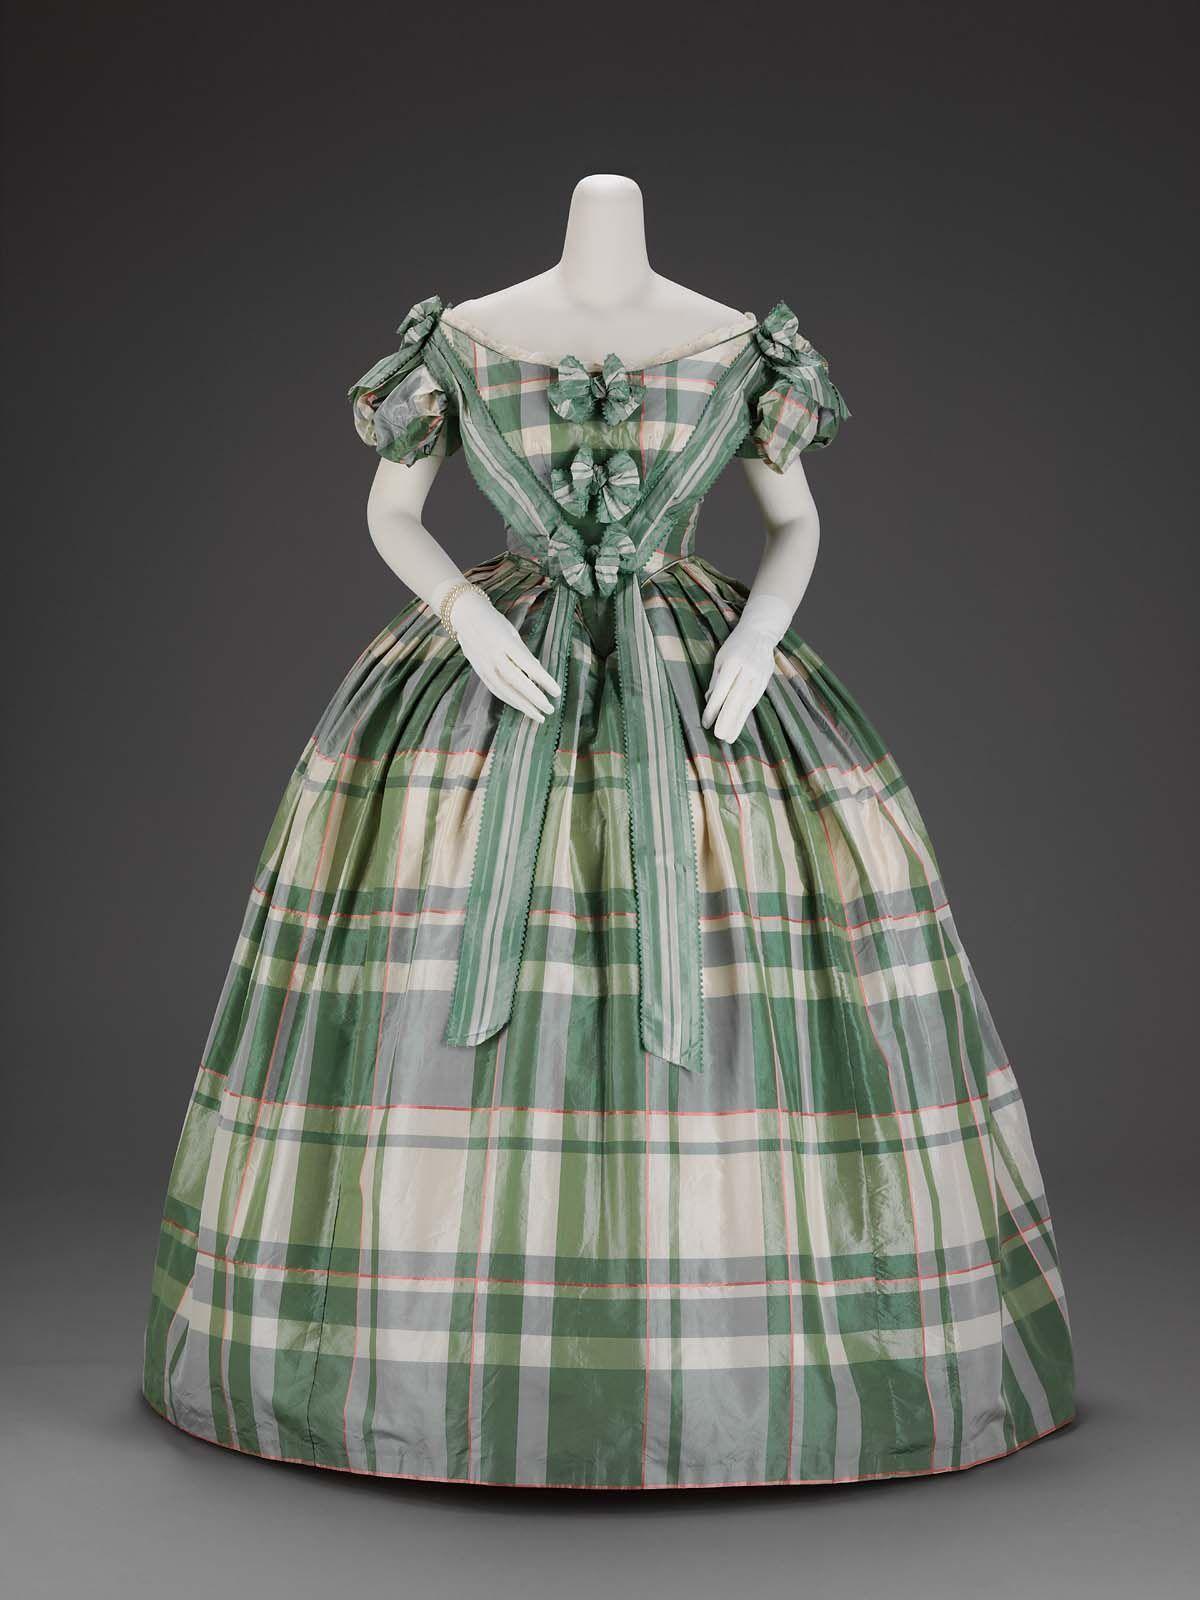 1859-60